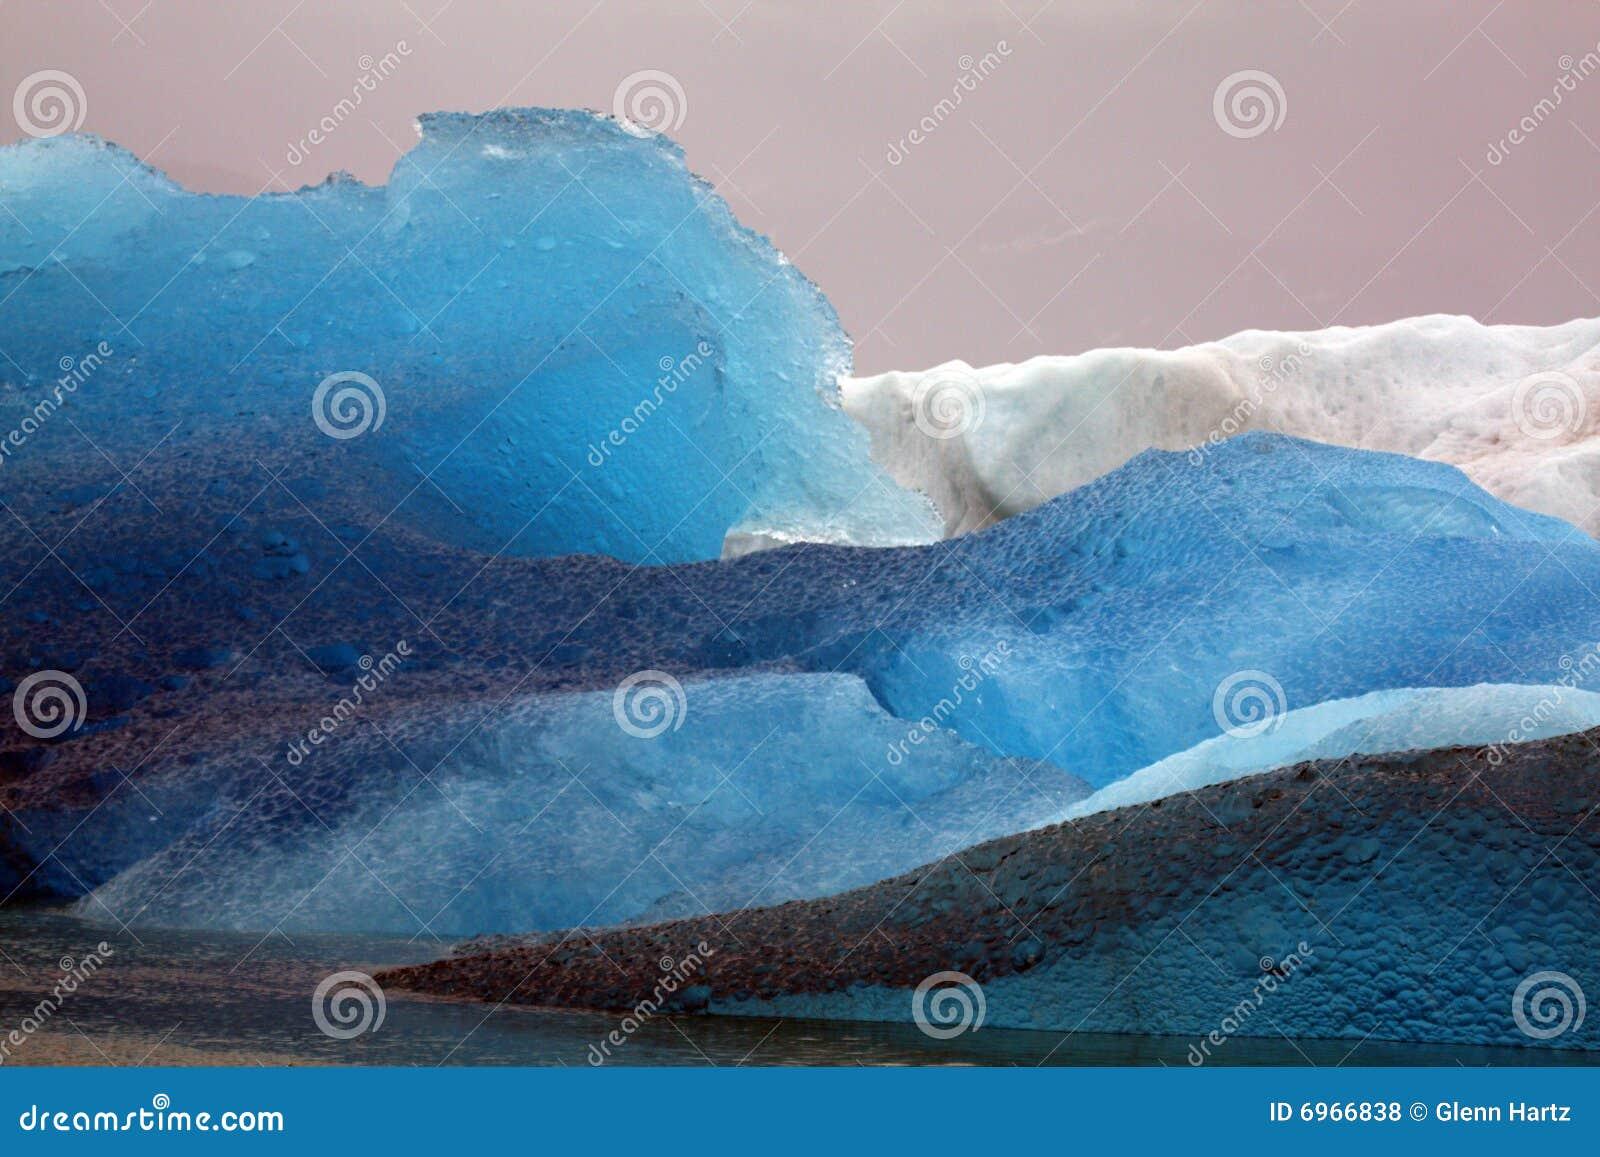 Icebergs from Glacier, Alaska